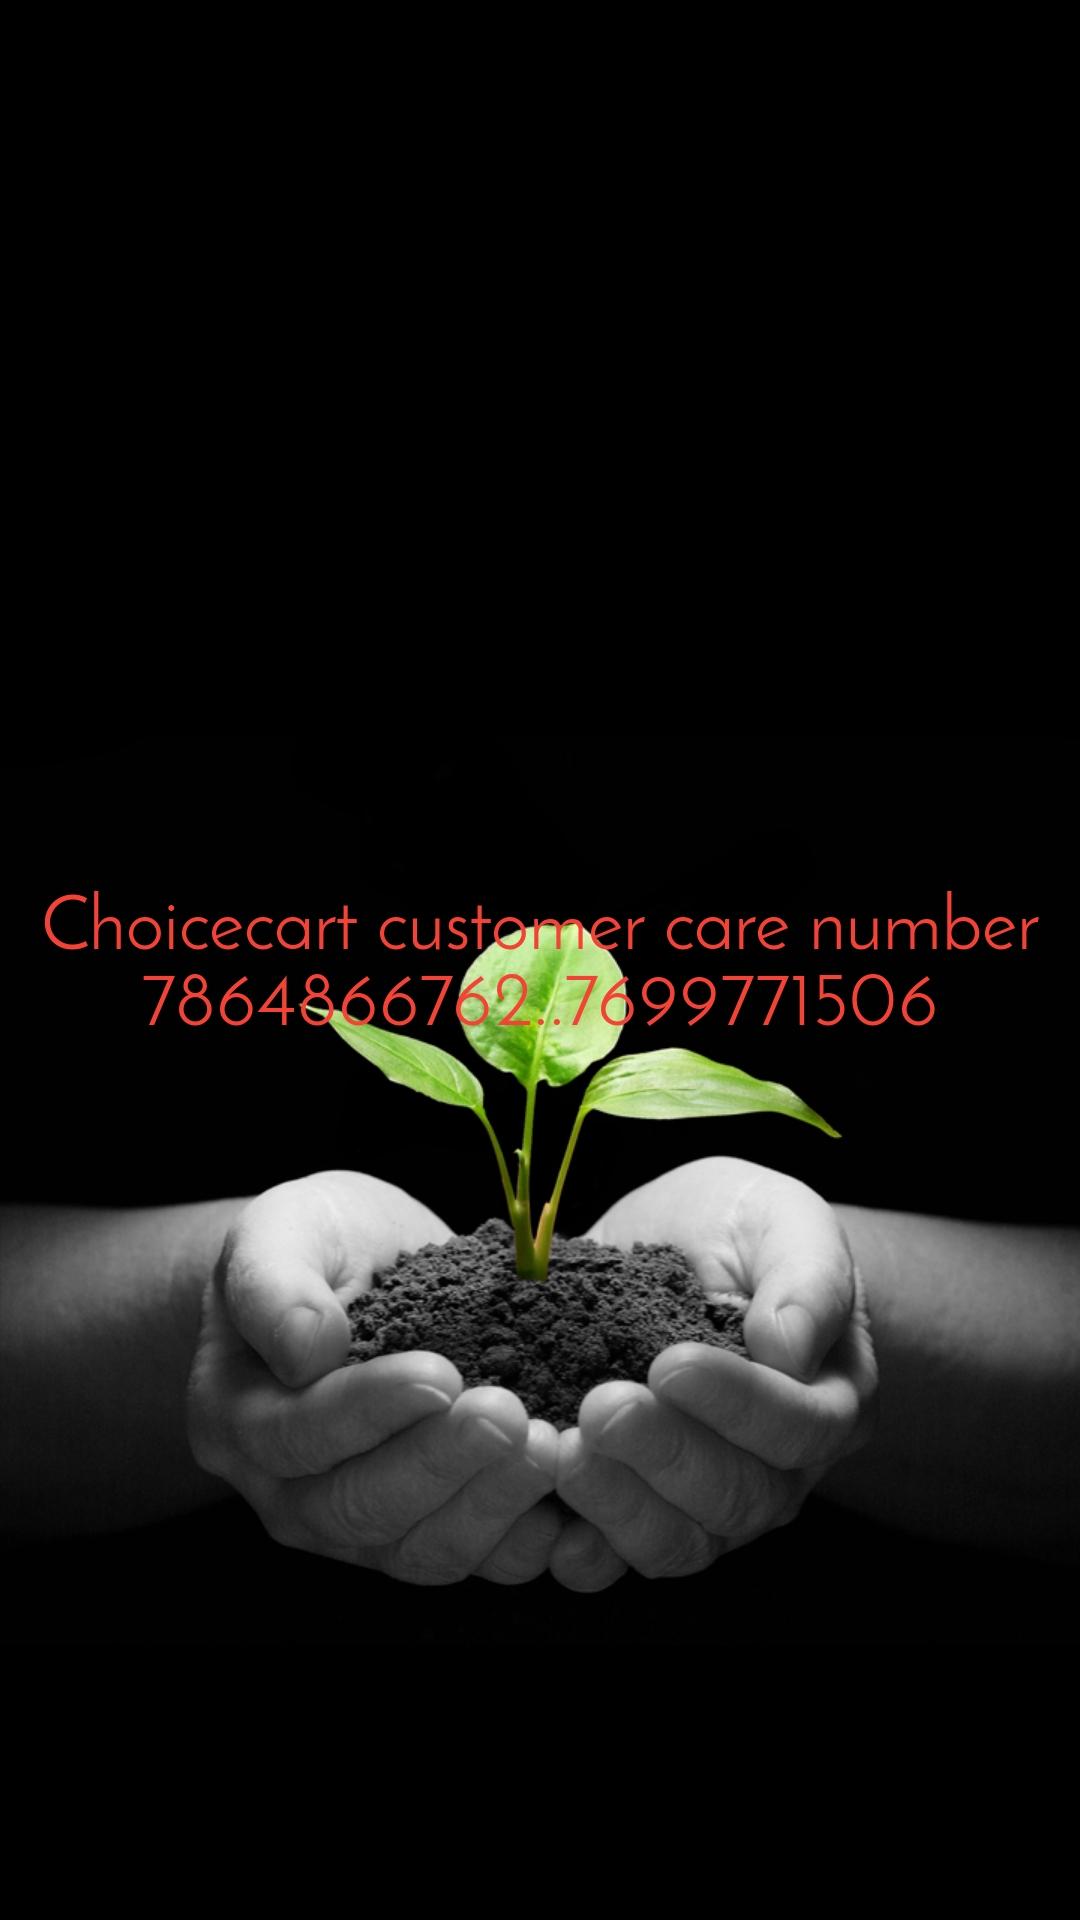 Choicecart customer care number 7864866762..7699771506